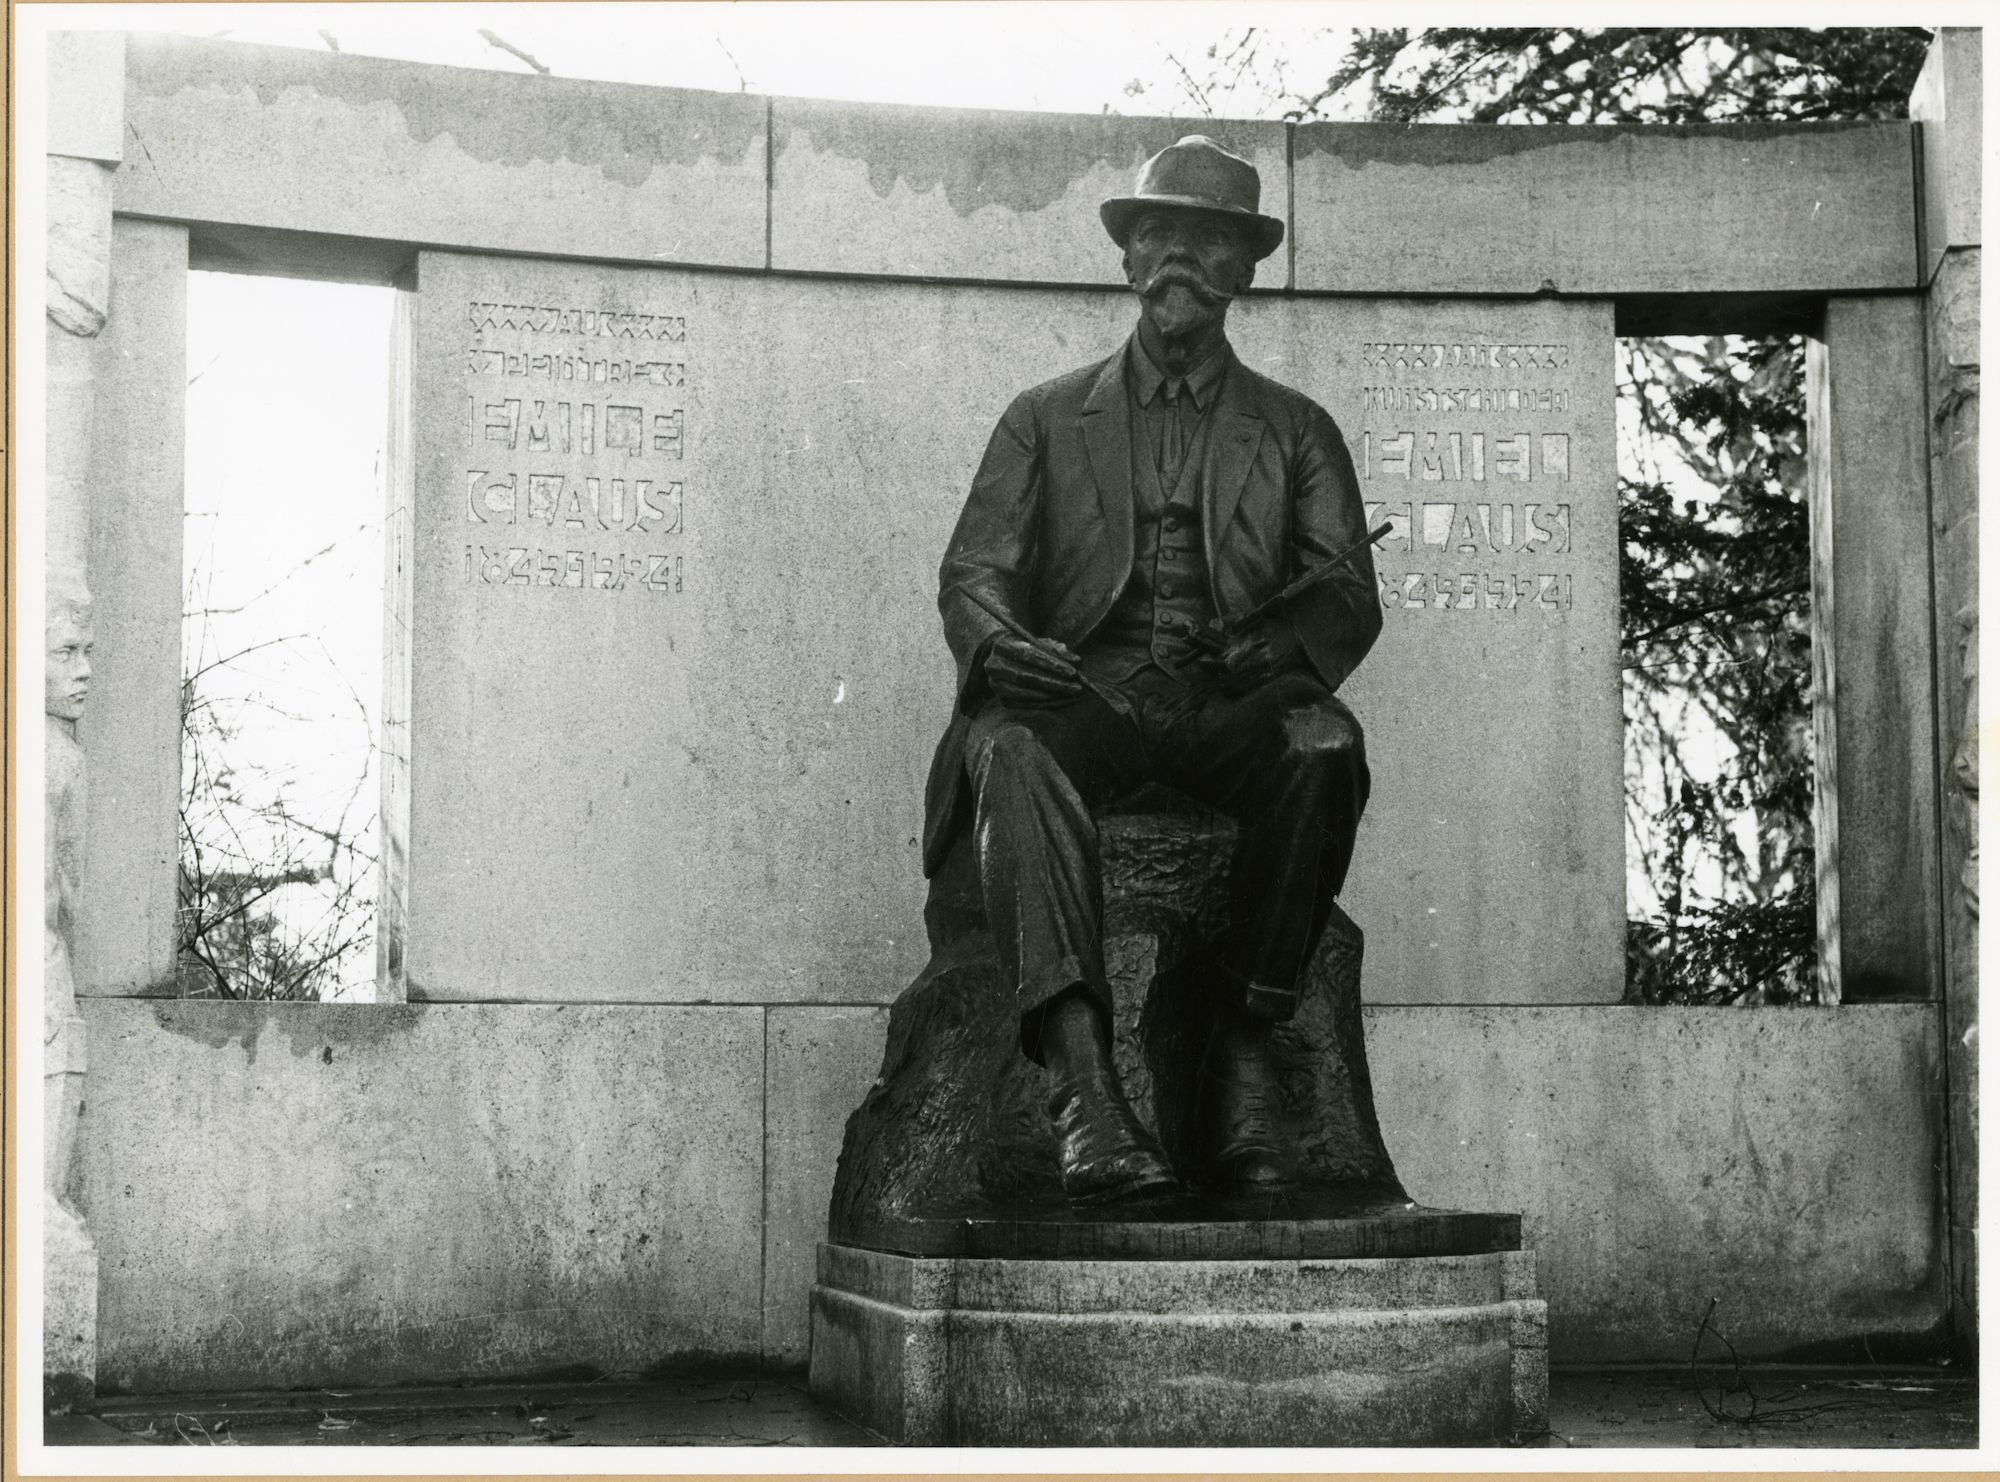 Gent: Emile Clauslaan: standbeeld: Emile Claus